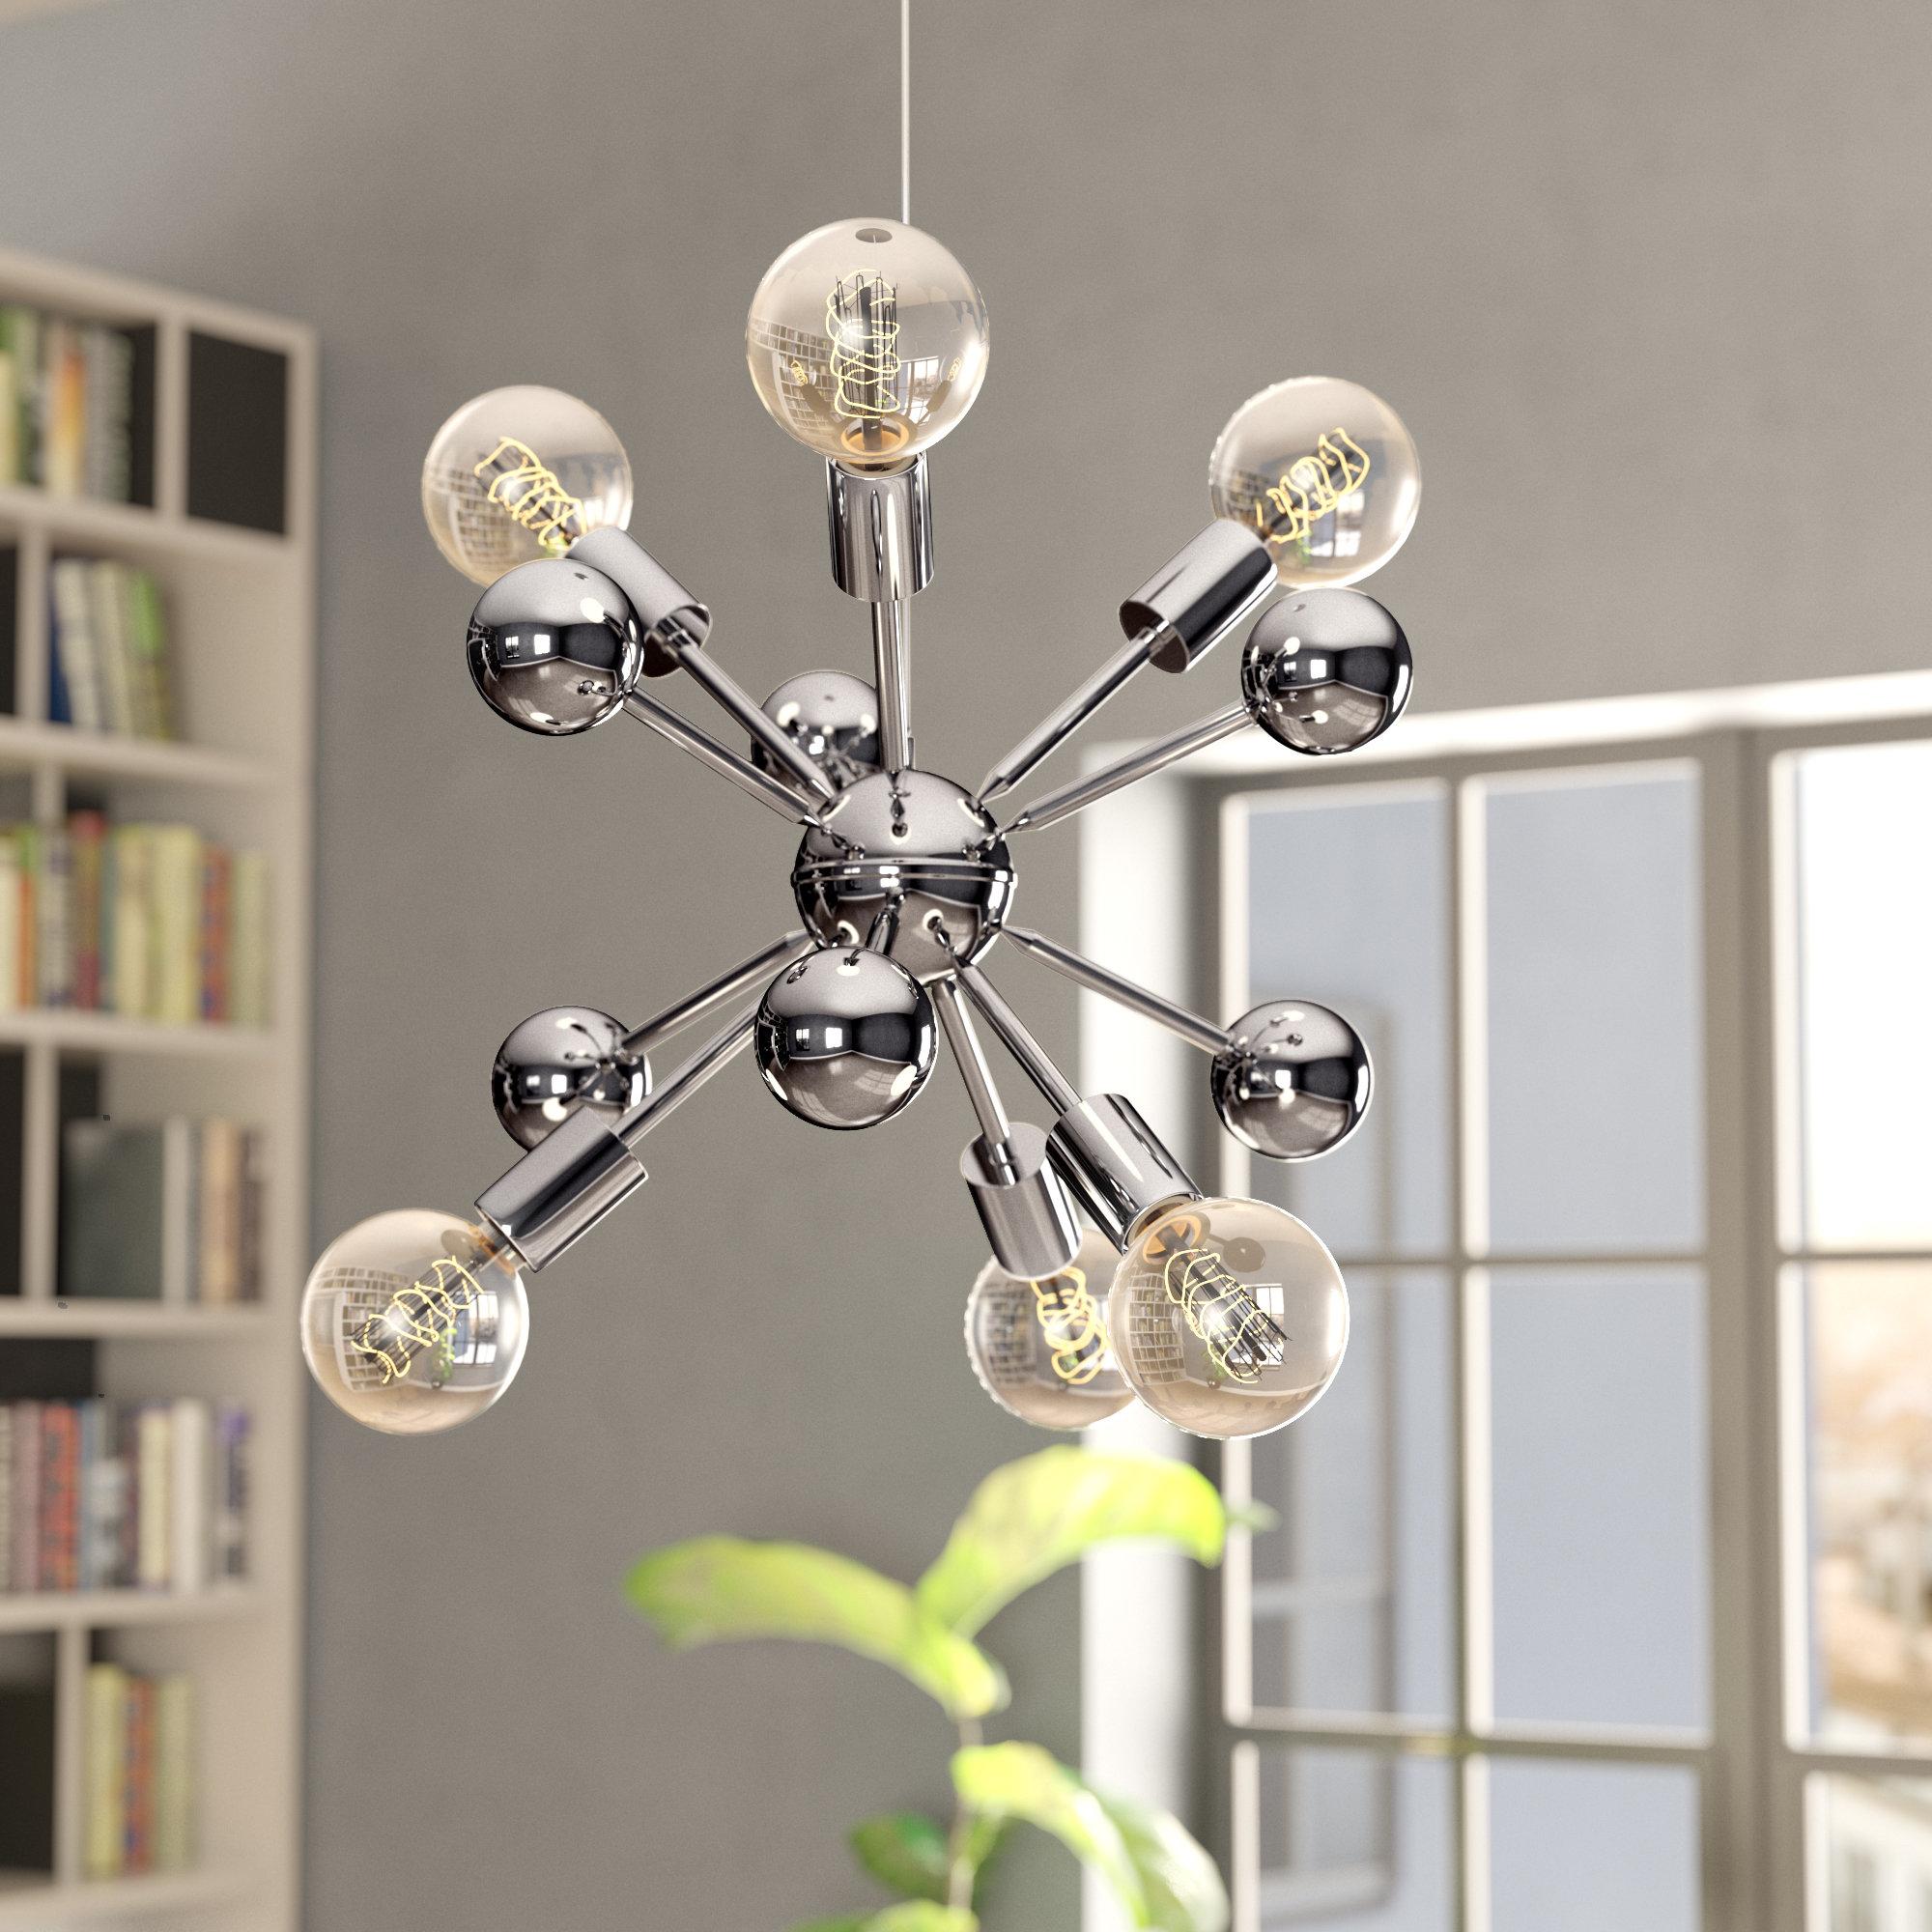 Dorcia 6 Light Sputnik Chandelier For Well Known Dirksen 3 Light Single Cylinder Chandeliers (View 6 of 20)